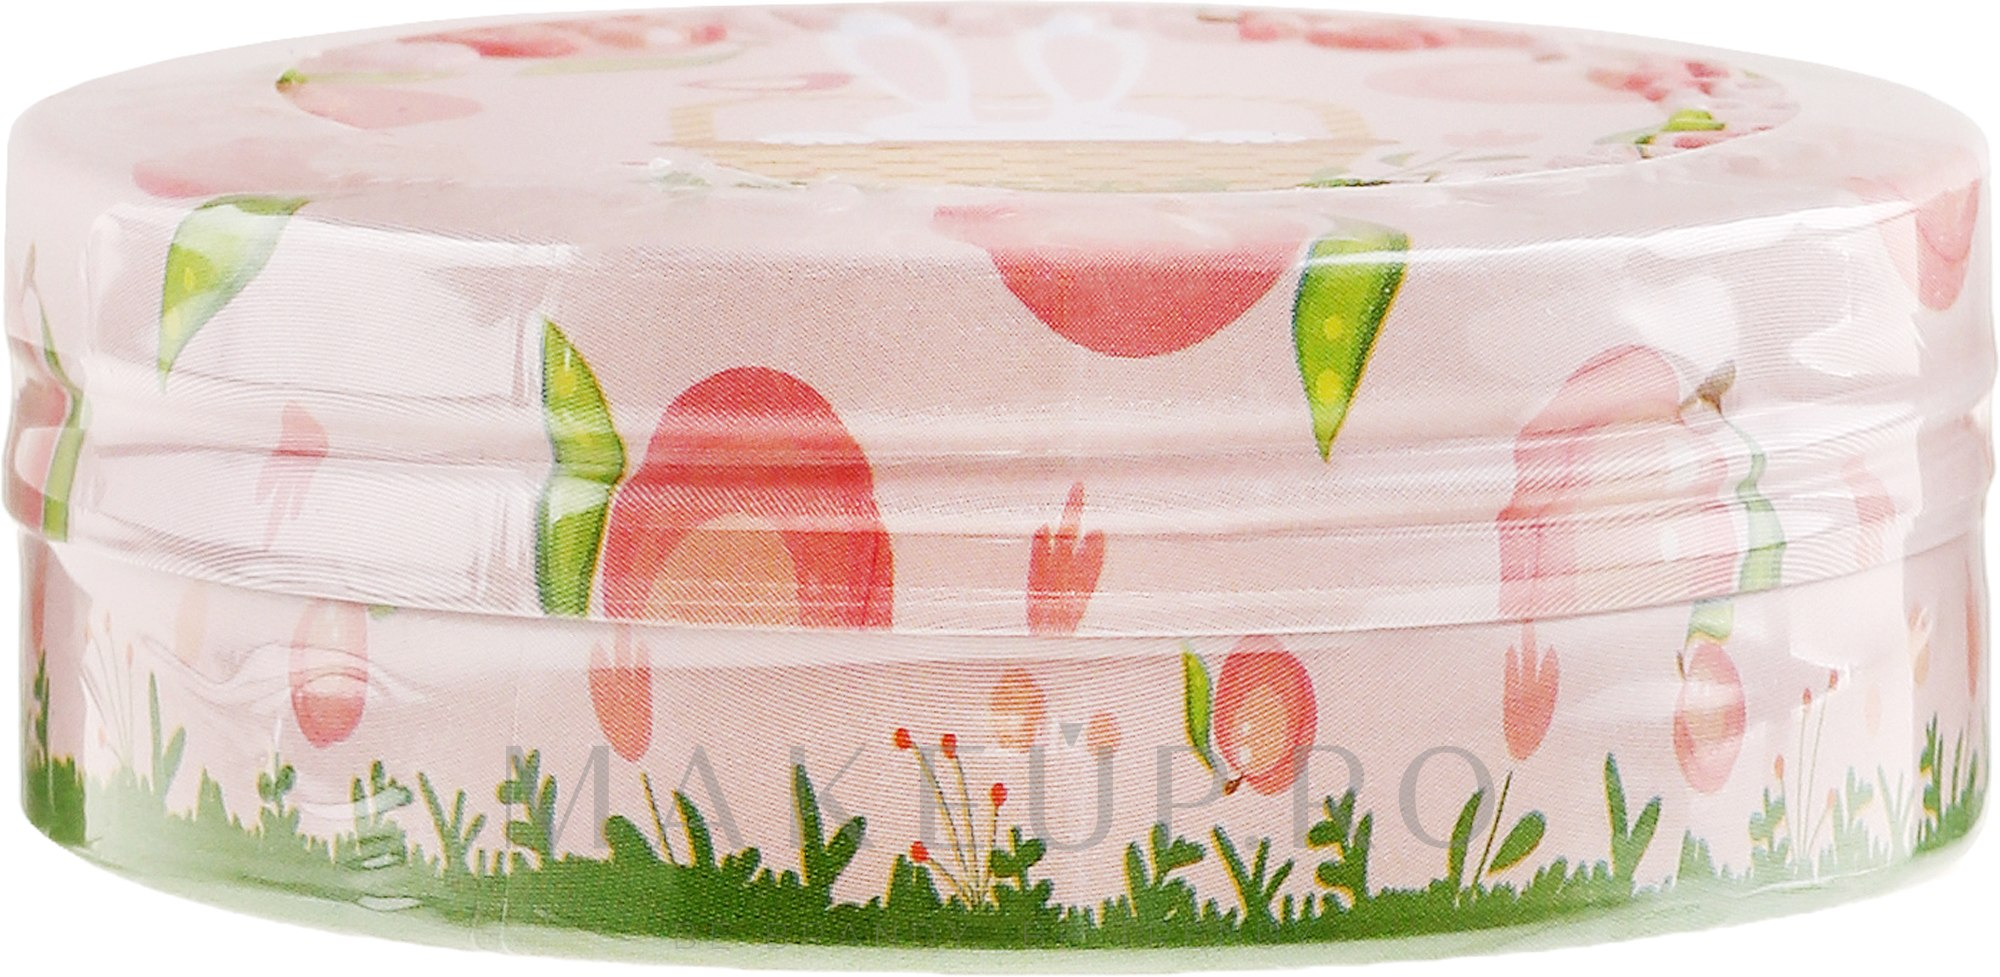 "Cremă de mâini ""Caise"" - SeaNtree Steam Hand Butter Cream Soft Peach Bunny — Imagine 35 ml"